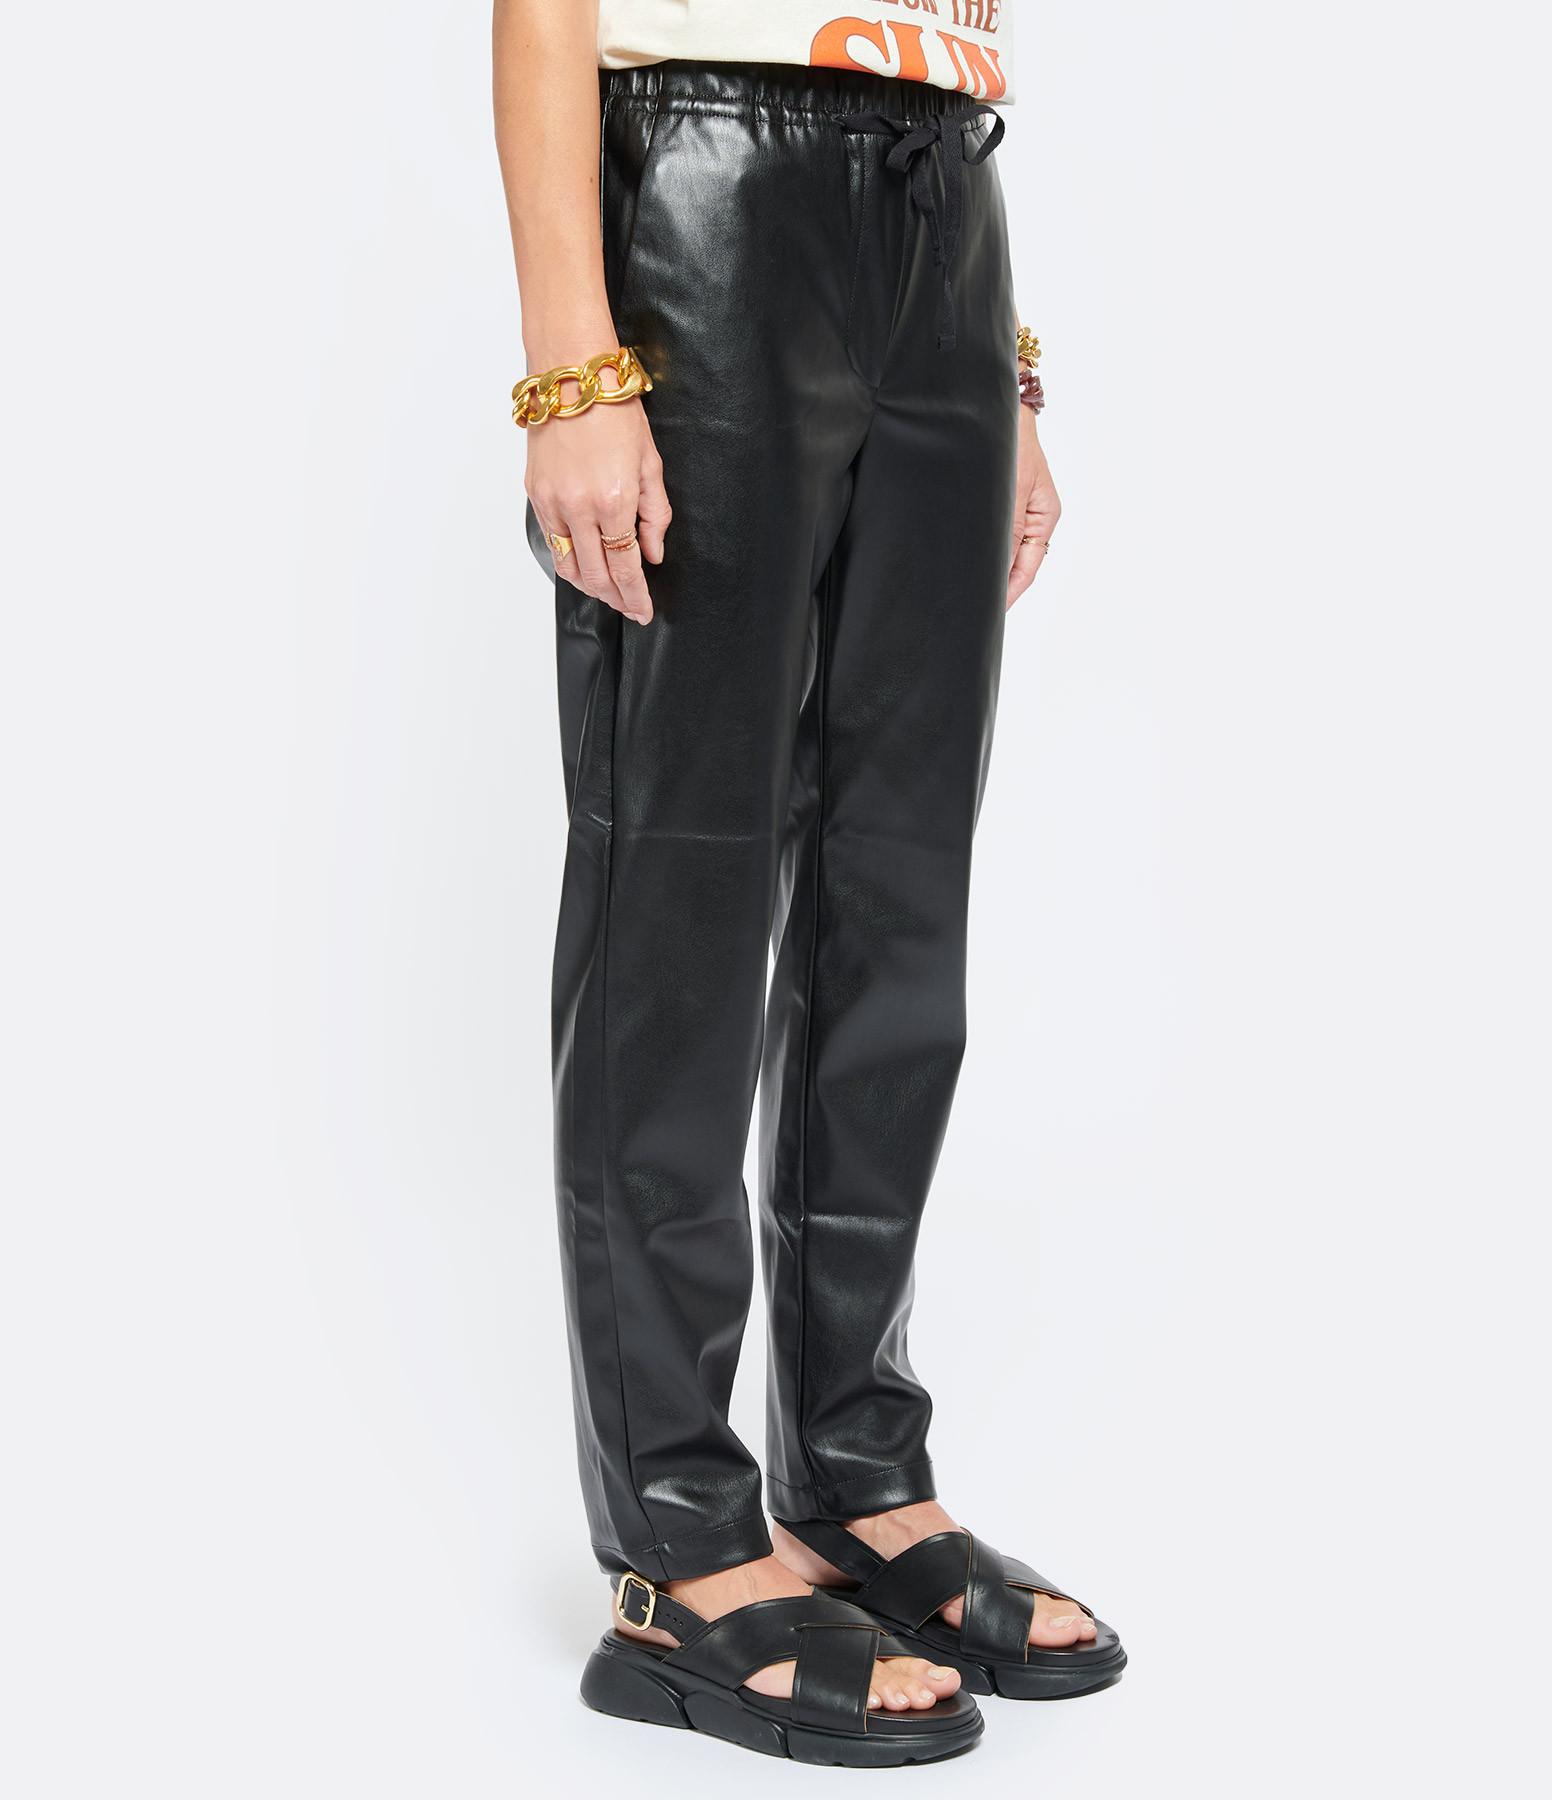 OVERLOVER - Pantalon Yucca Cuir Noir